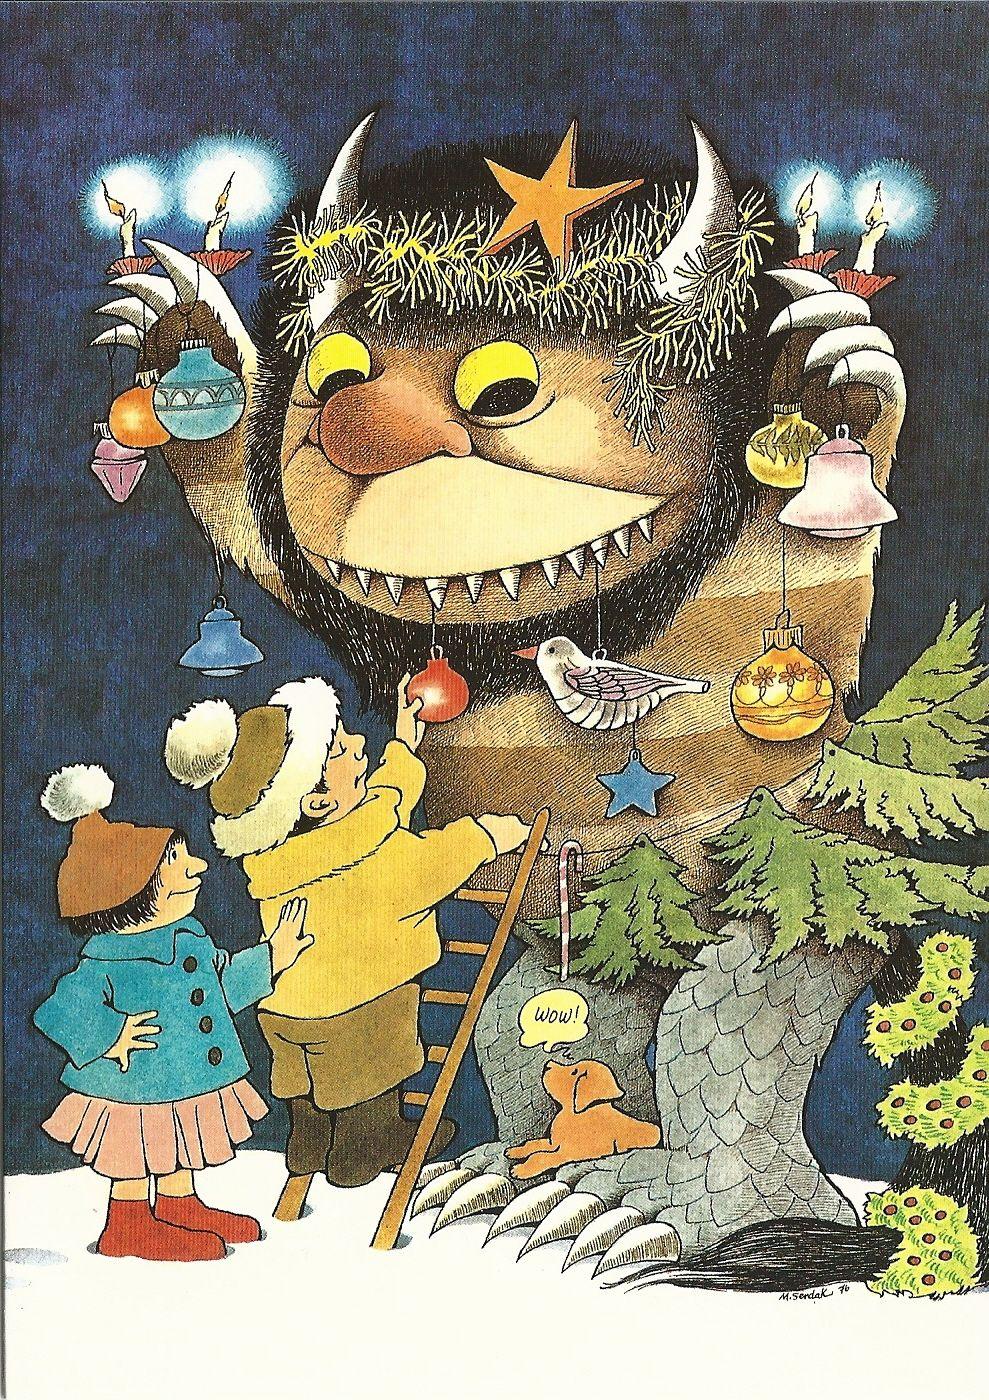 The Wise Robin Classic Artwork Ladybird Books Illustration